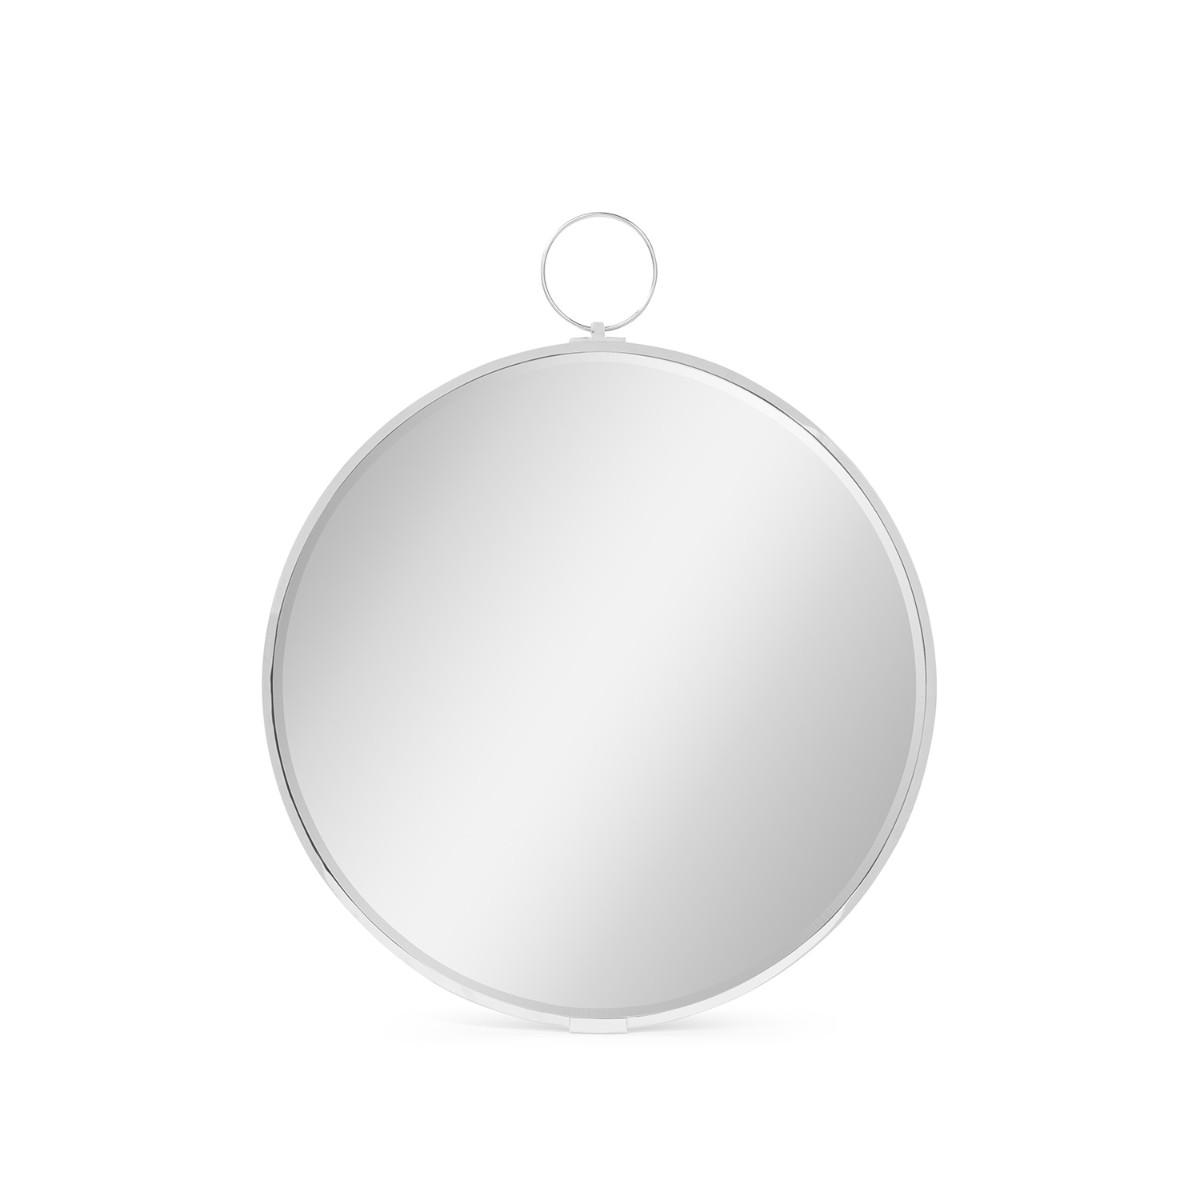 William Yeoward | Avalone Round Wall Mirror Nickel